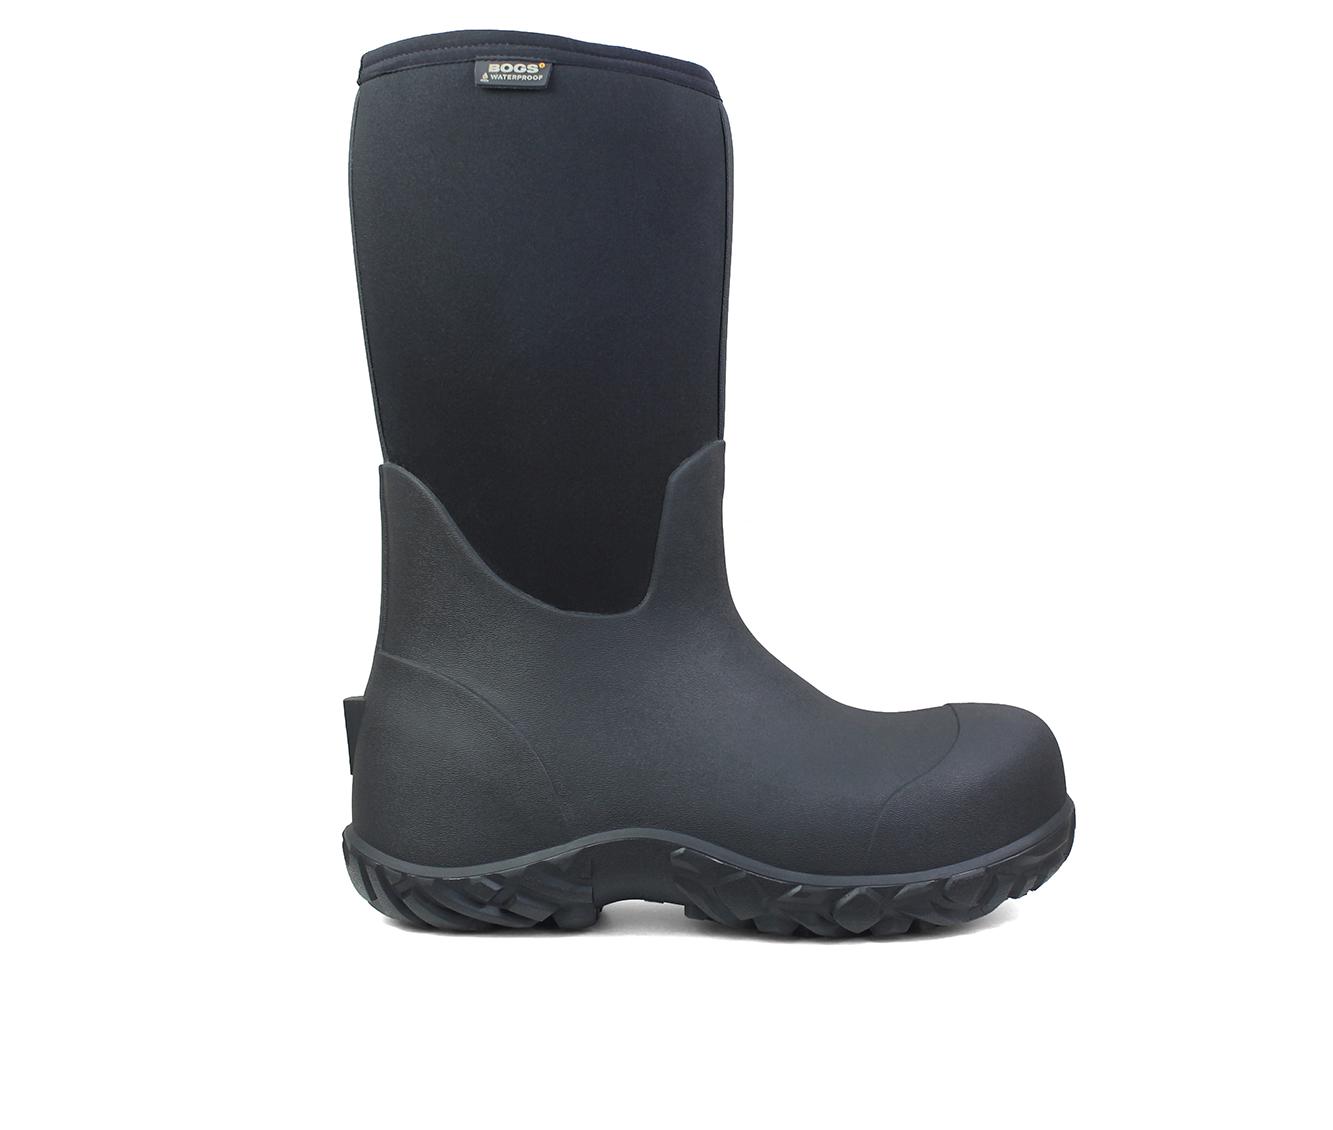 Bogs Footwear Workman Comp Toe Men's Boots (Black Fabric)